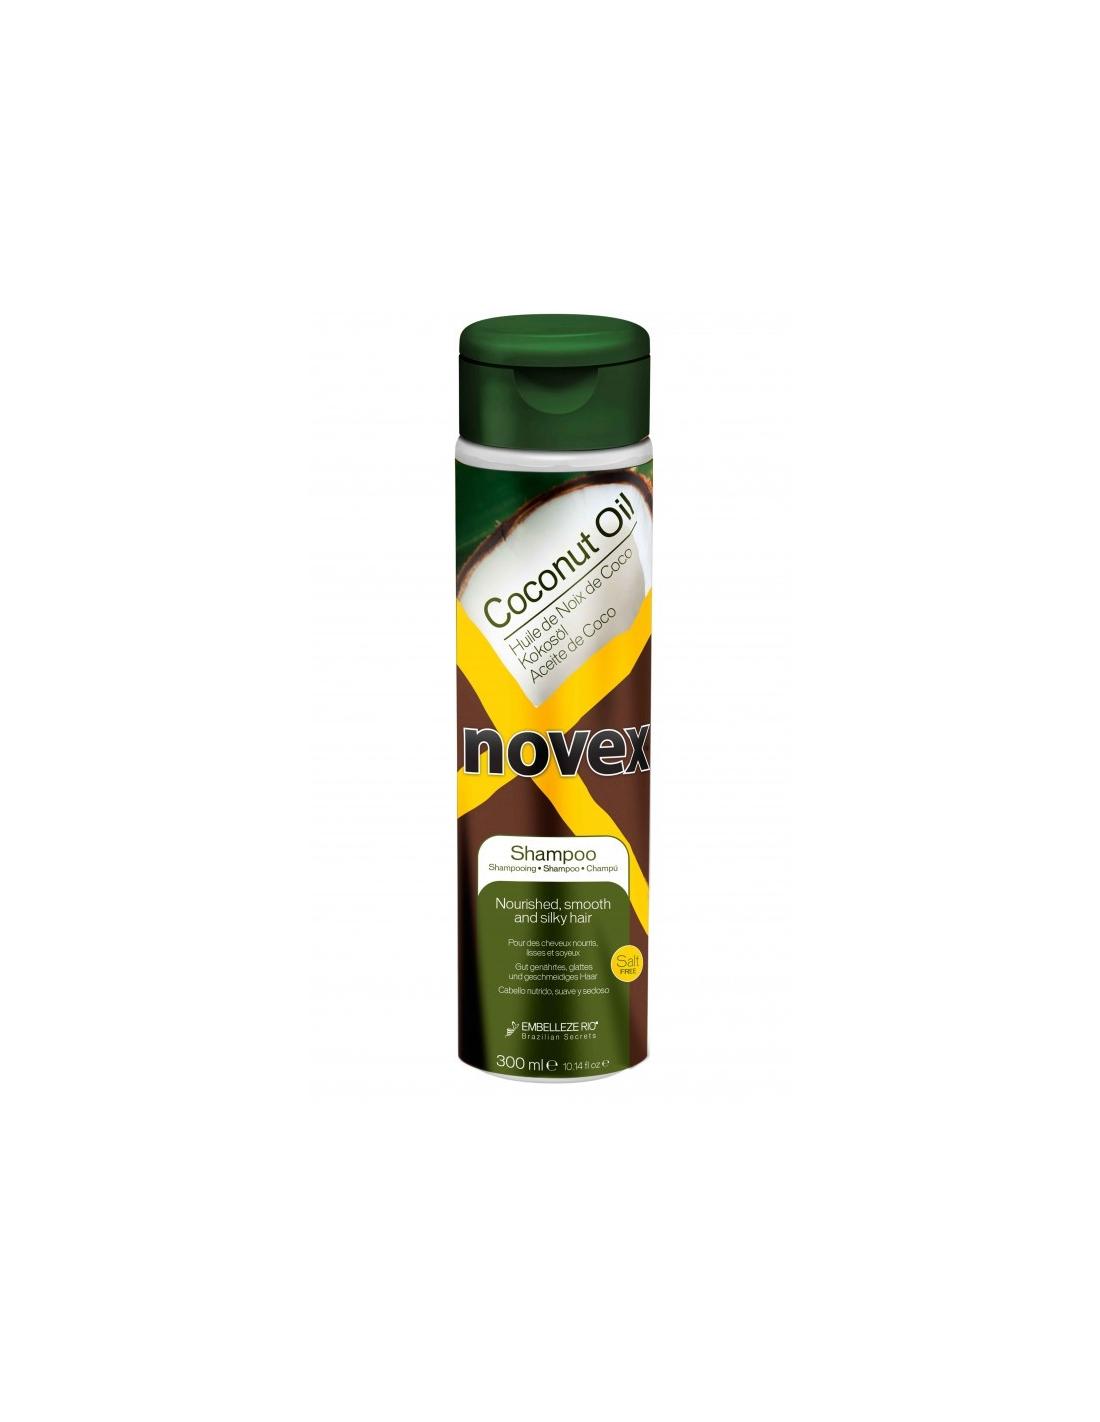 novex coconutoil shampoo 300 ml. Black Bedroom Furniture Sets. Home Design Ideas